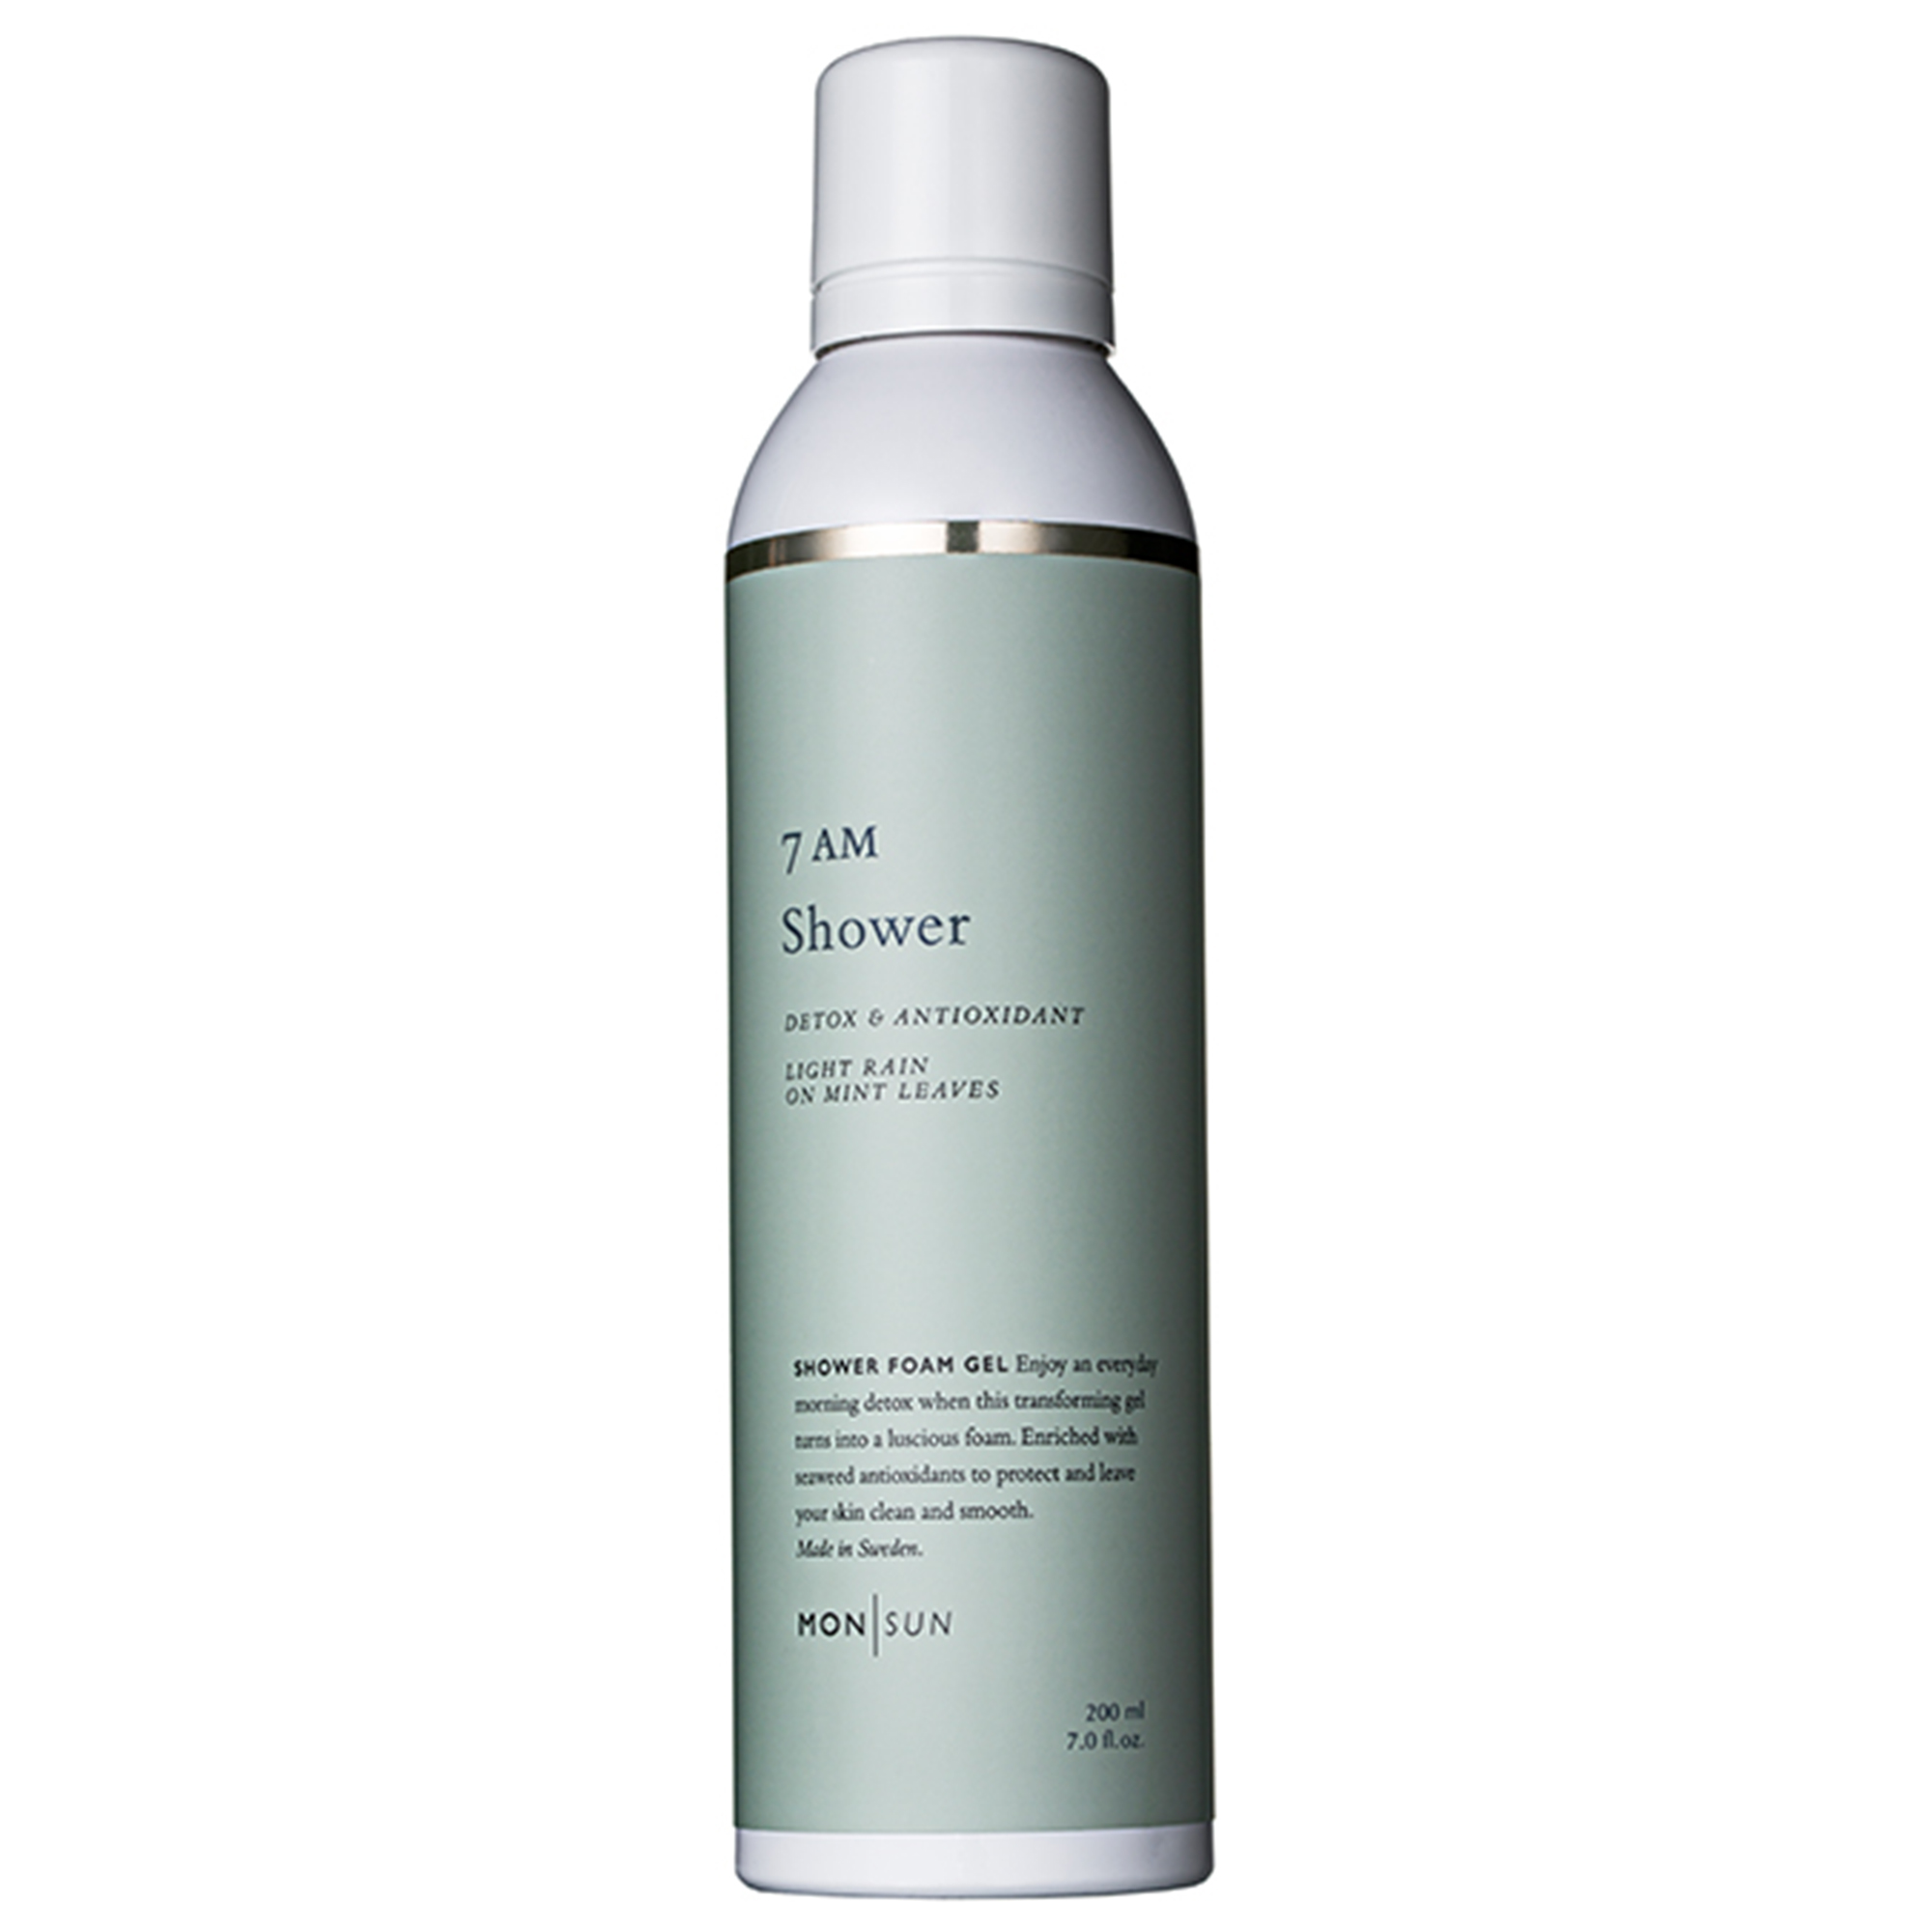 7AM Shower Detox & Antioxidant Shower Gel 200ml